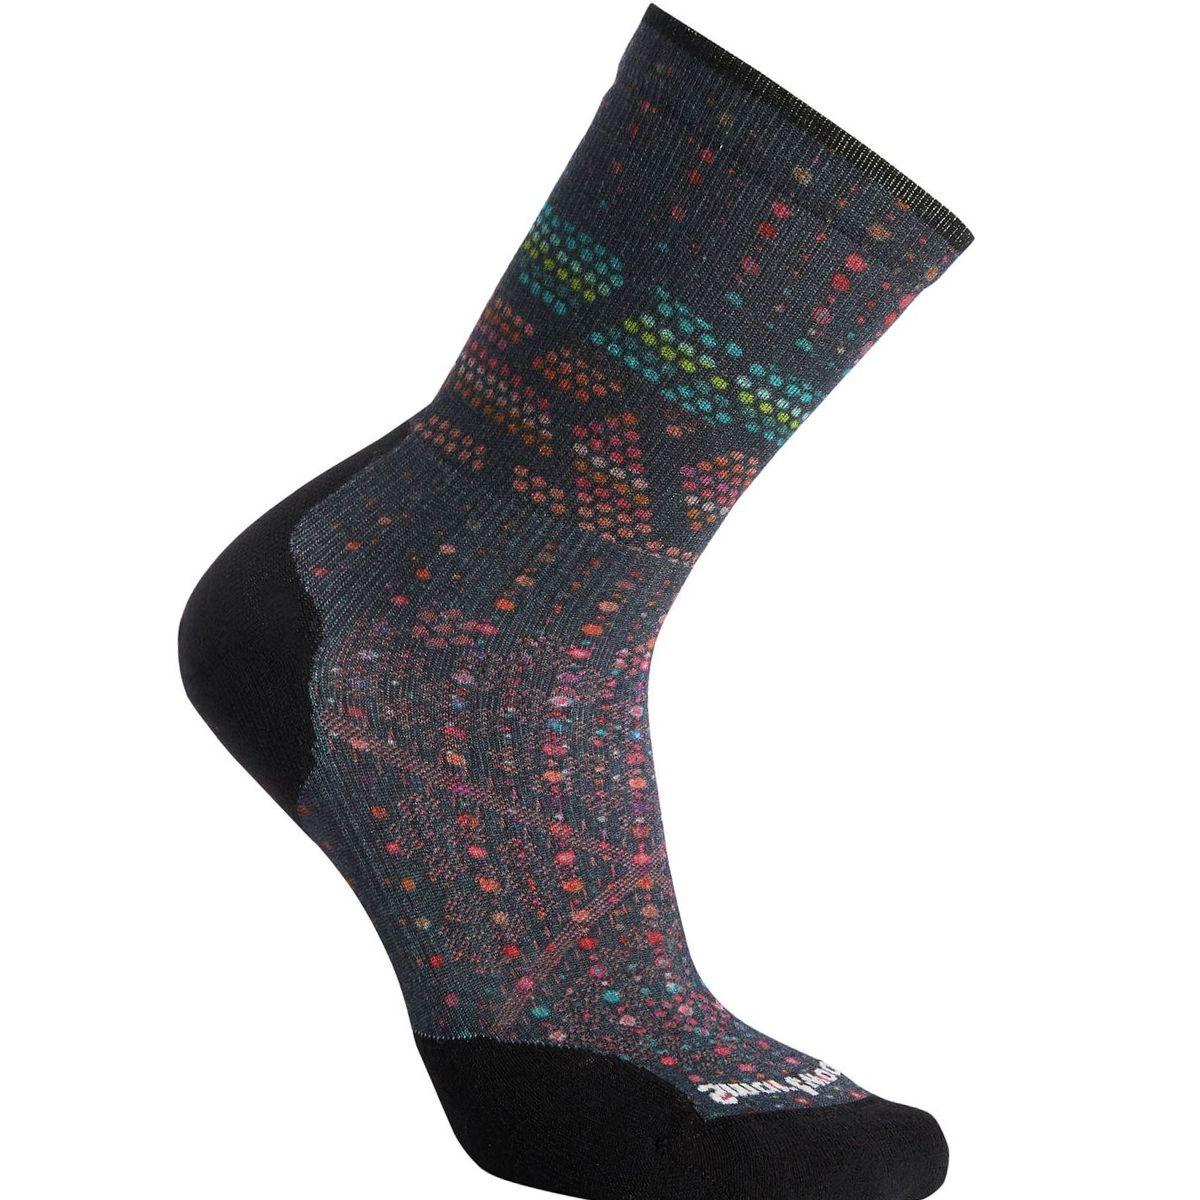 Smartwool PhD Run Light Elite Print Crew Sock - Women's